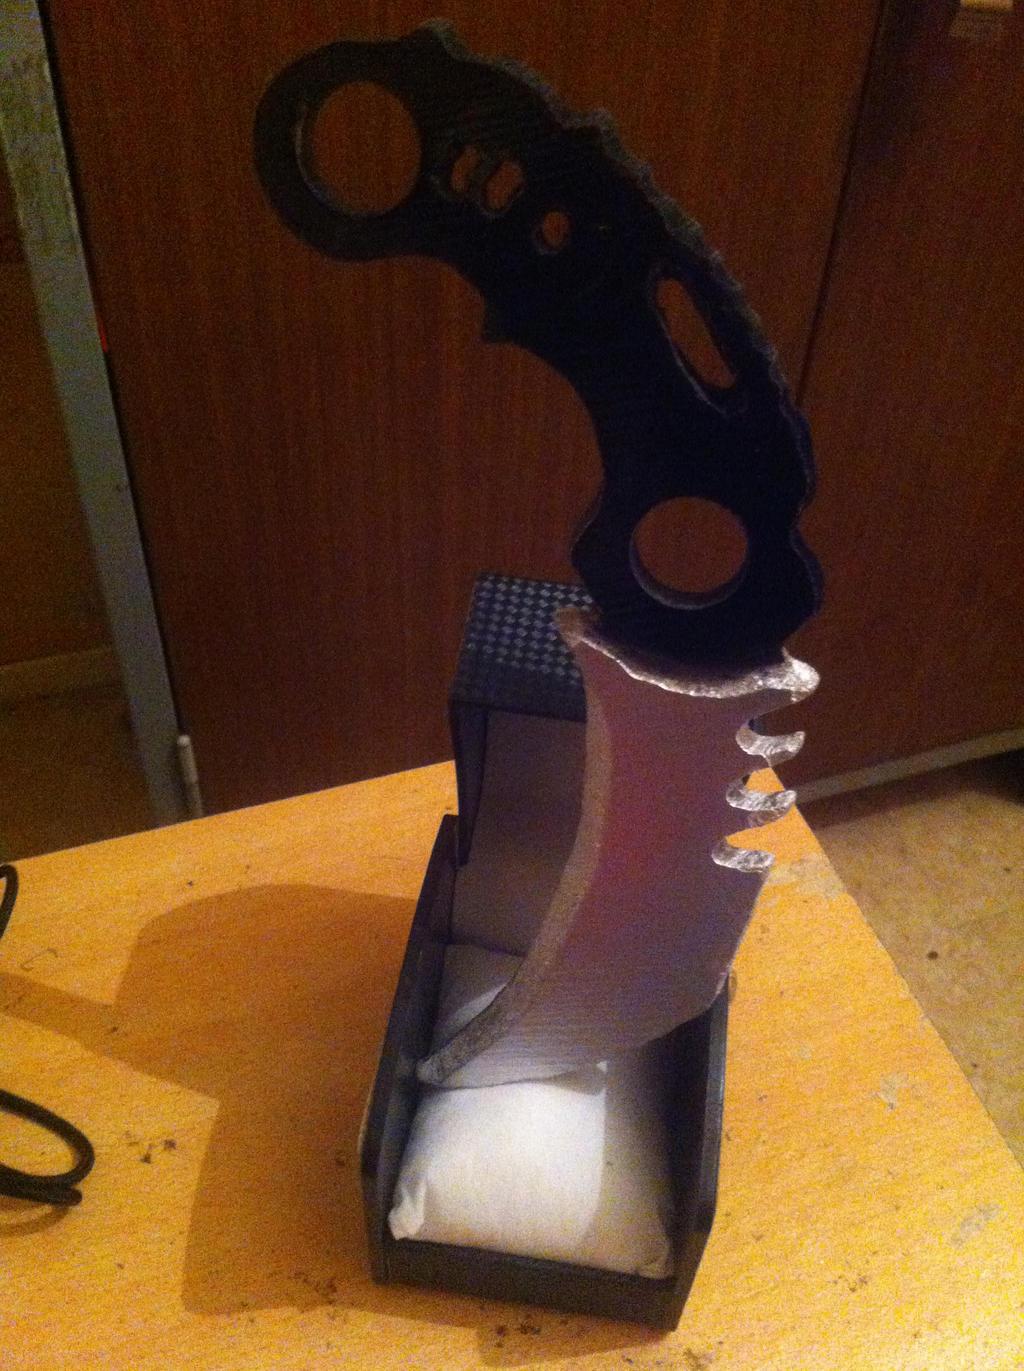 knife karambit from splinter cell blacklist by cpt r fisher - Splinter Cell Halloween Costume